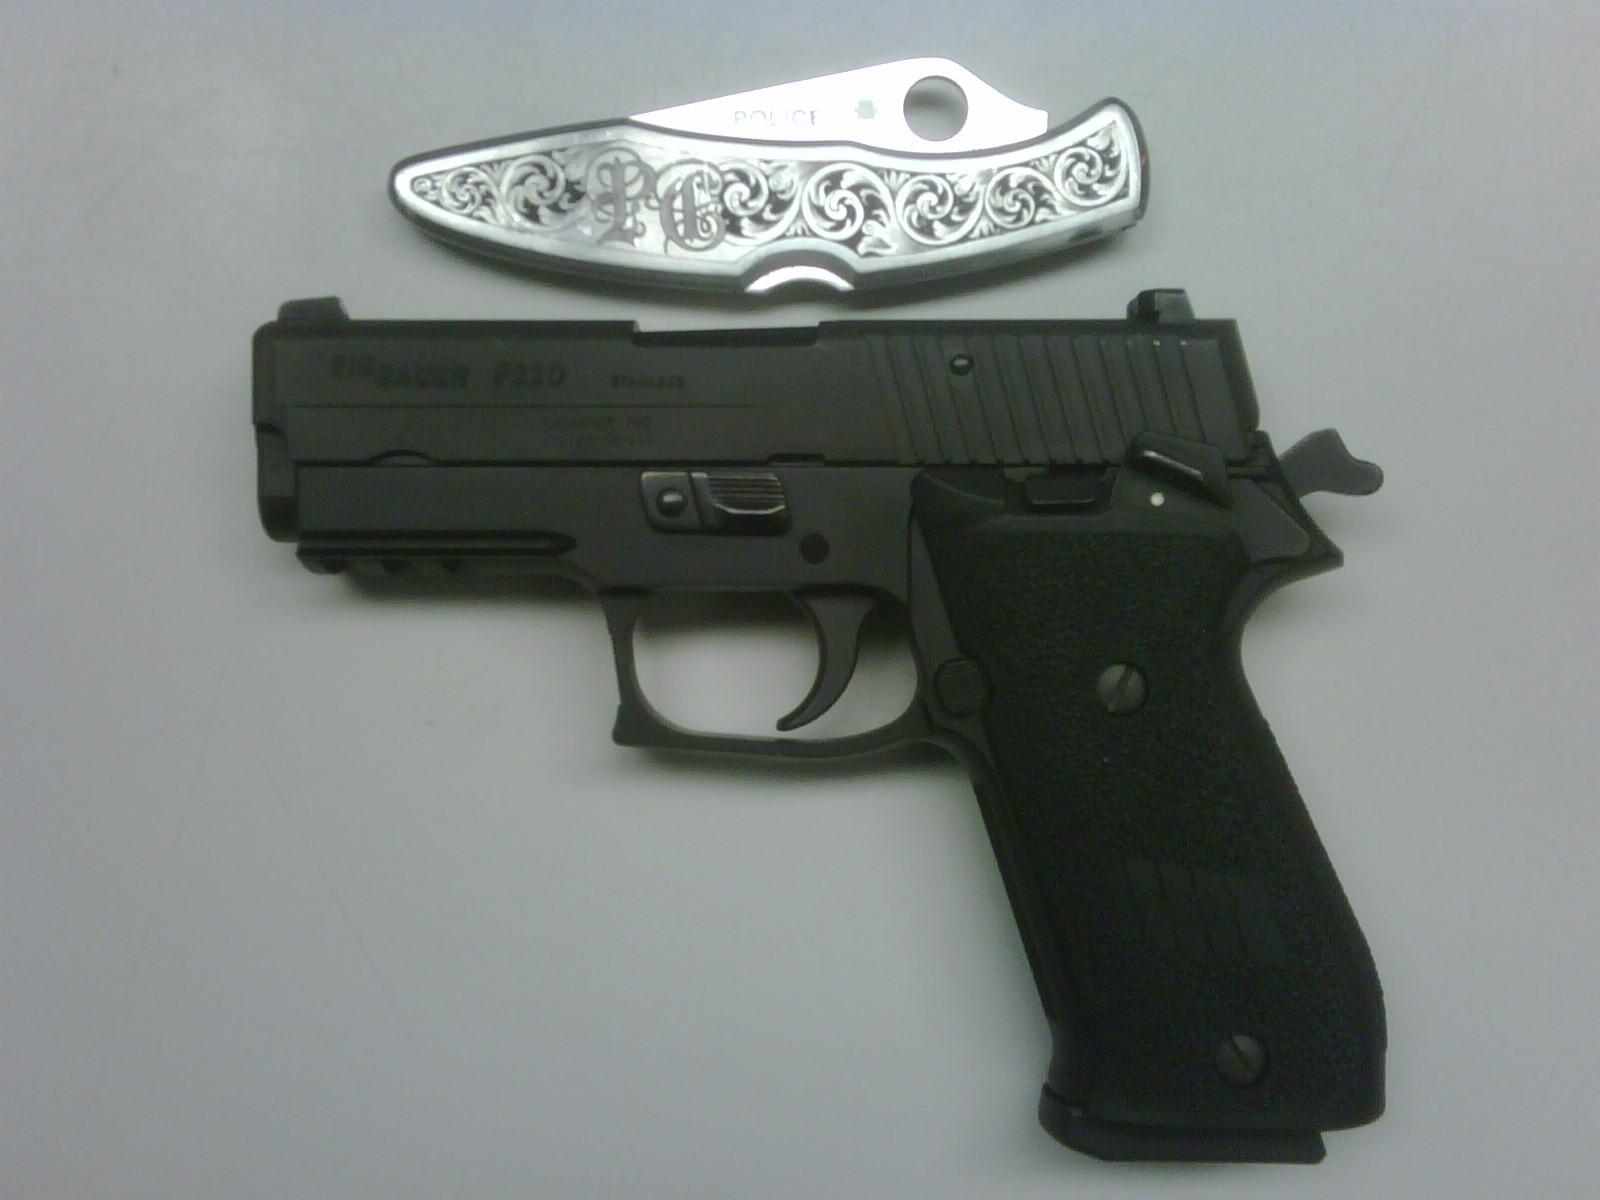 Pics of my SIG P220 SAO in Comp-Tac-img00161-20090302-1934.jpg